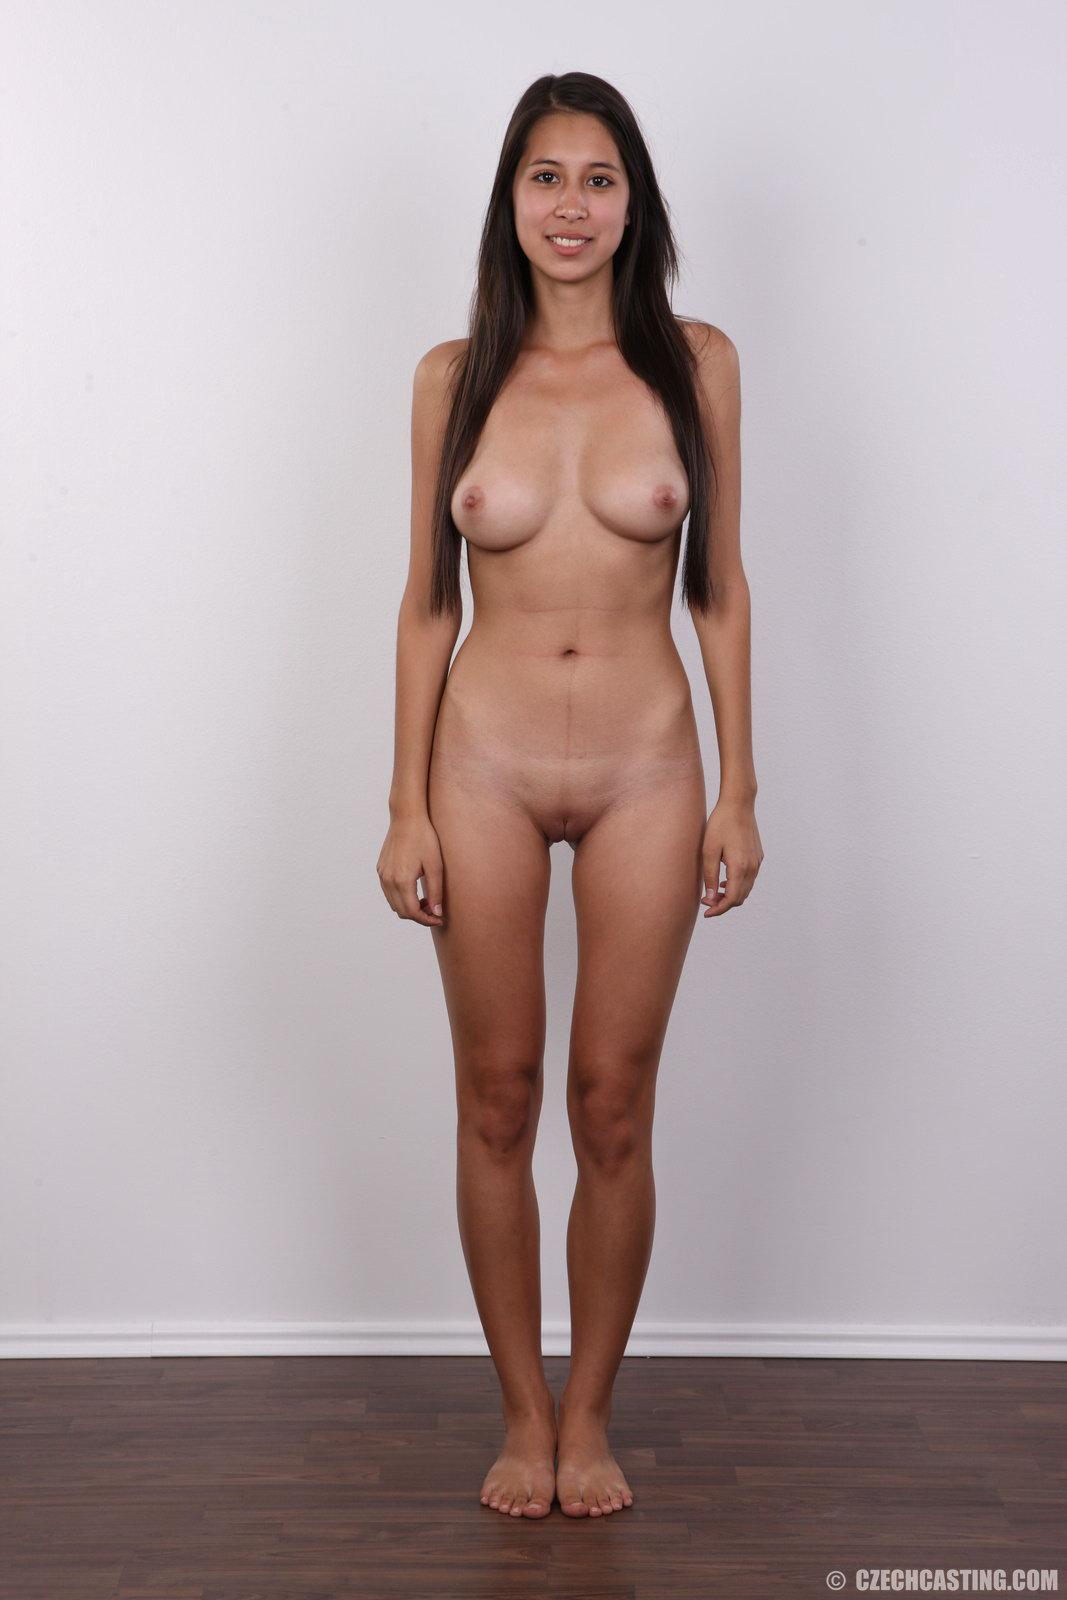 Czech Casting Girls Nude - Datawav-2277